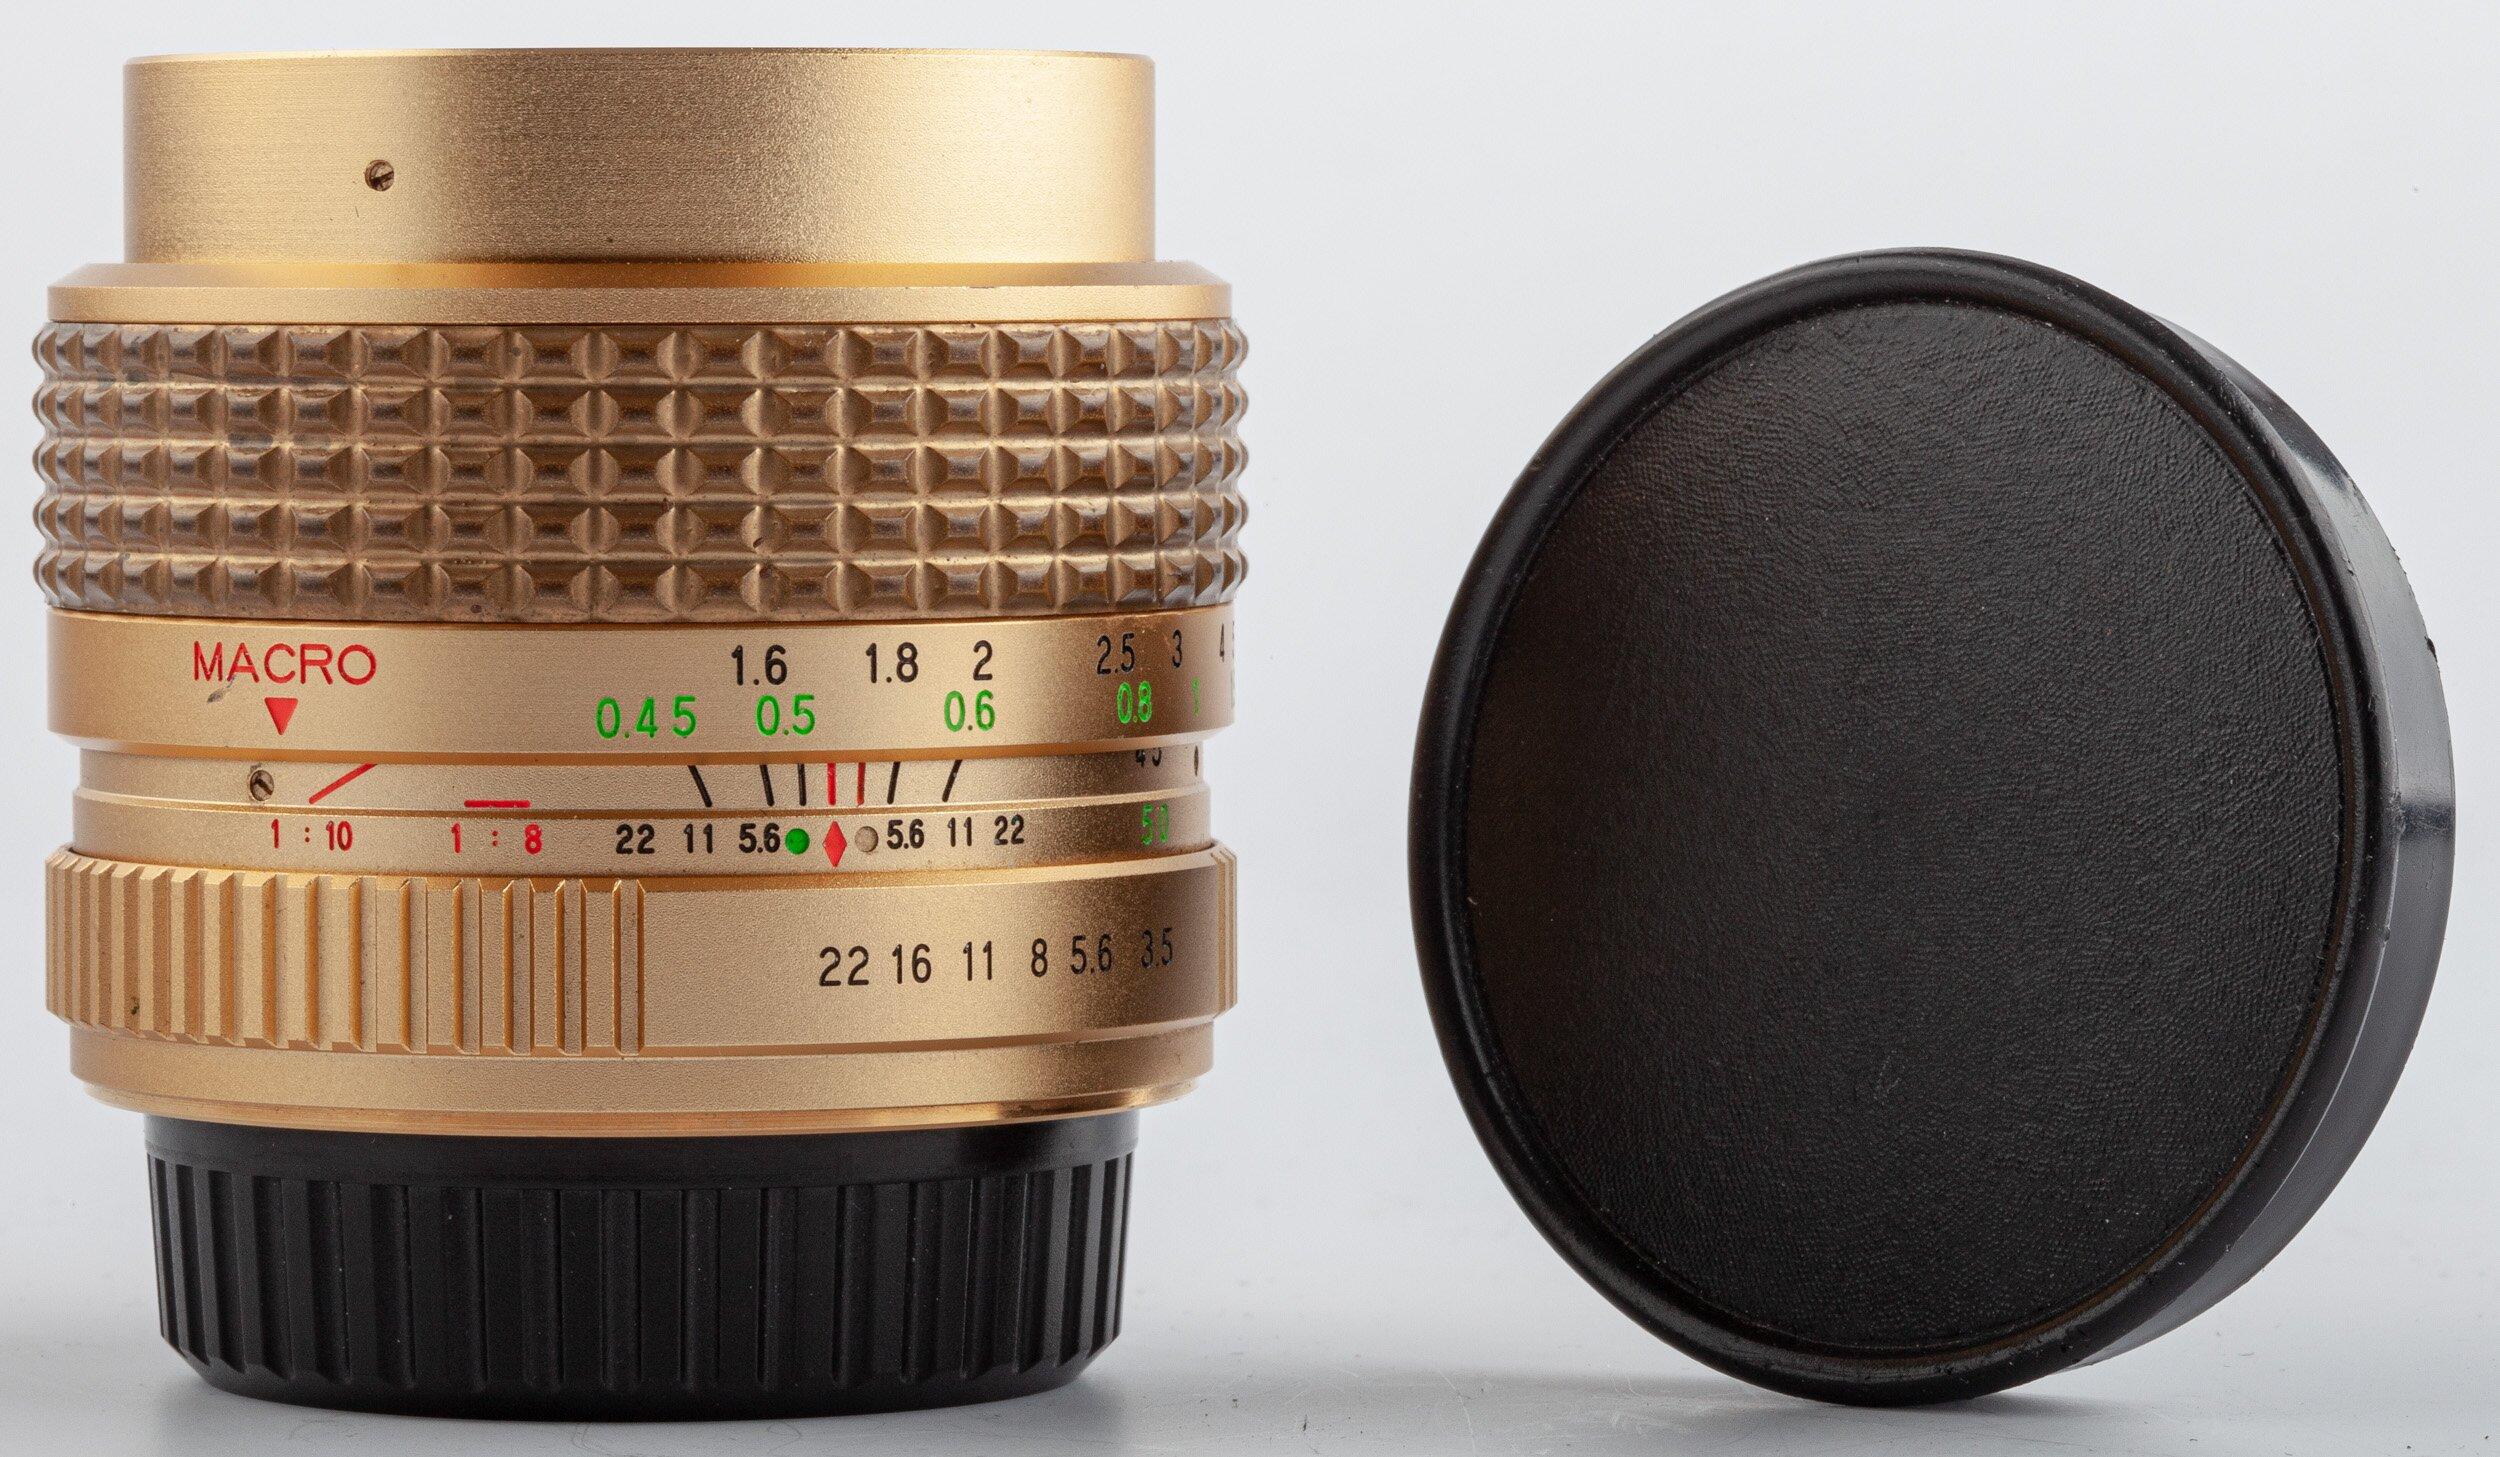 Pentax PK Sicor 28-50mm F3.5-4.5 Gold Edition